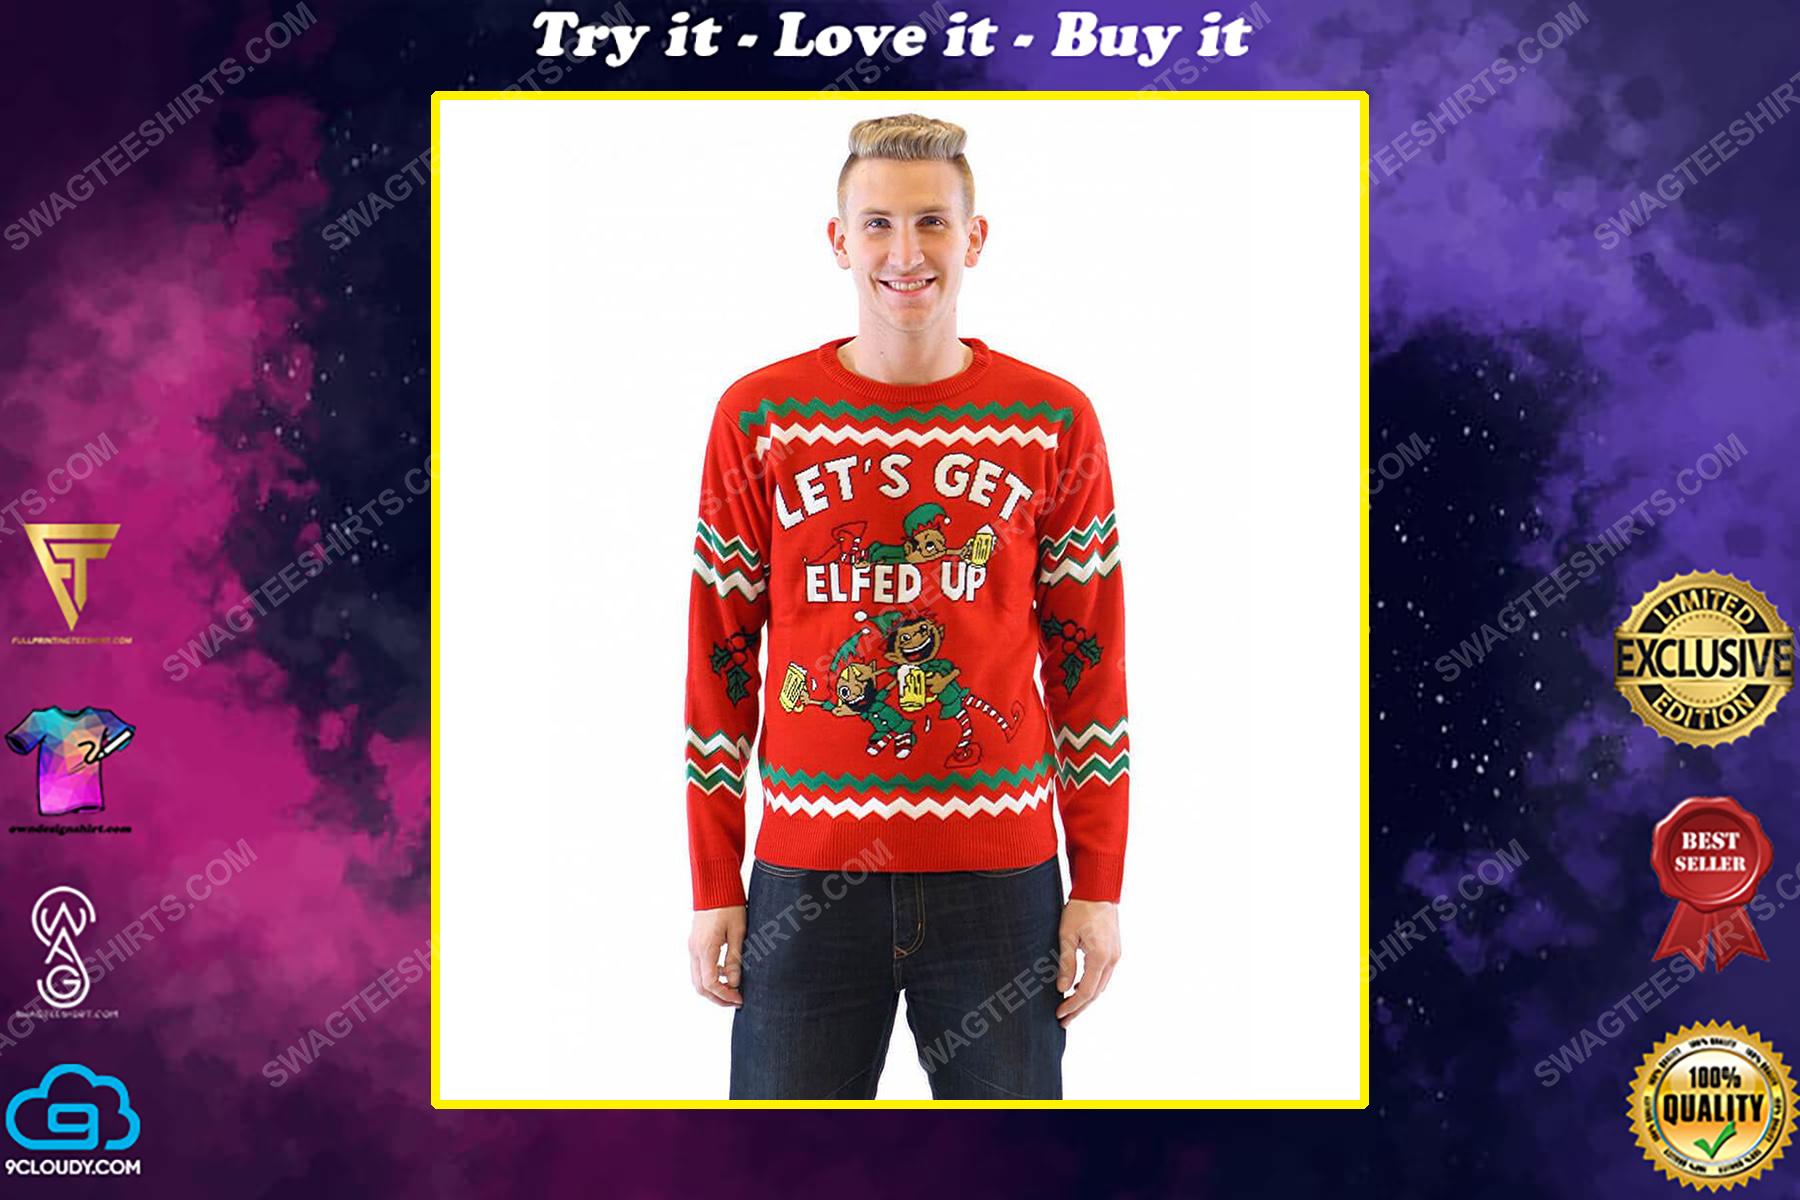 Let's get elfed up drunken elves full print ugly christmas sweater